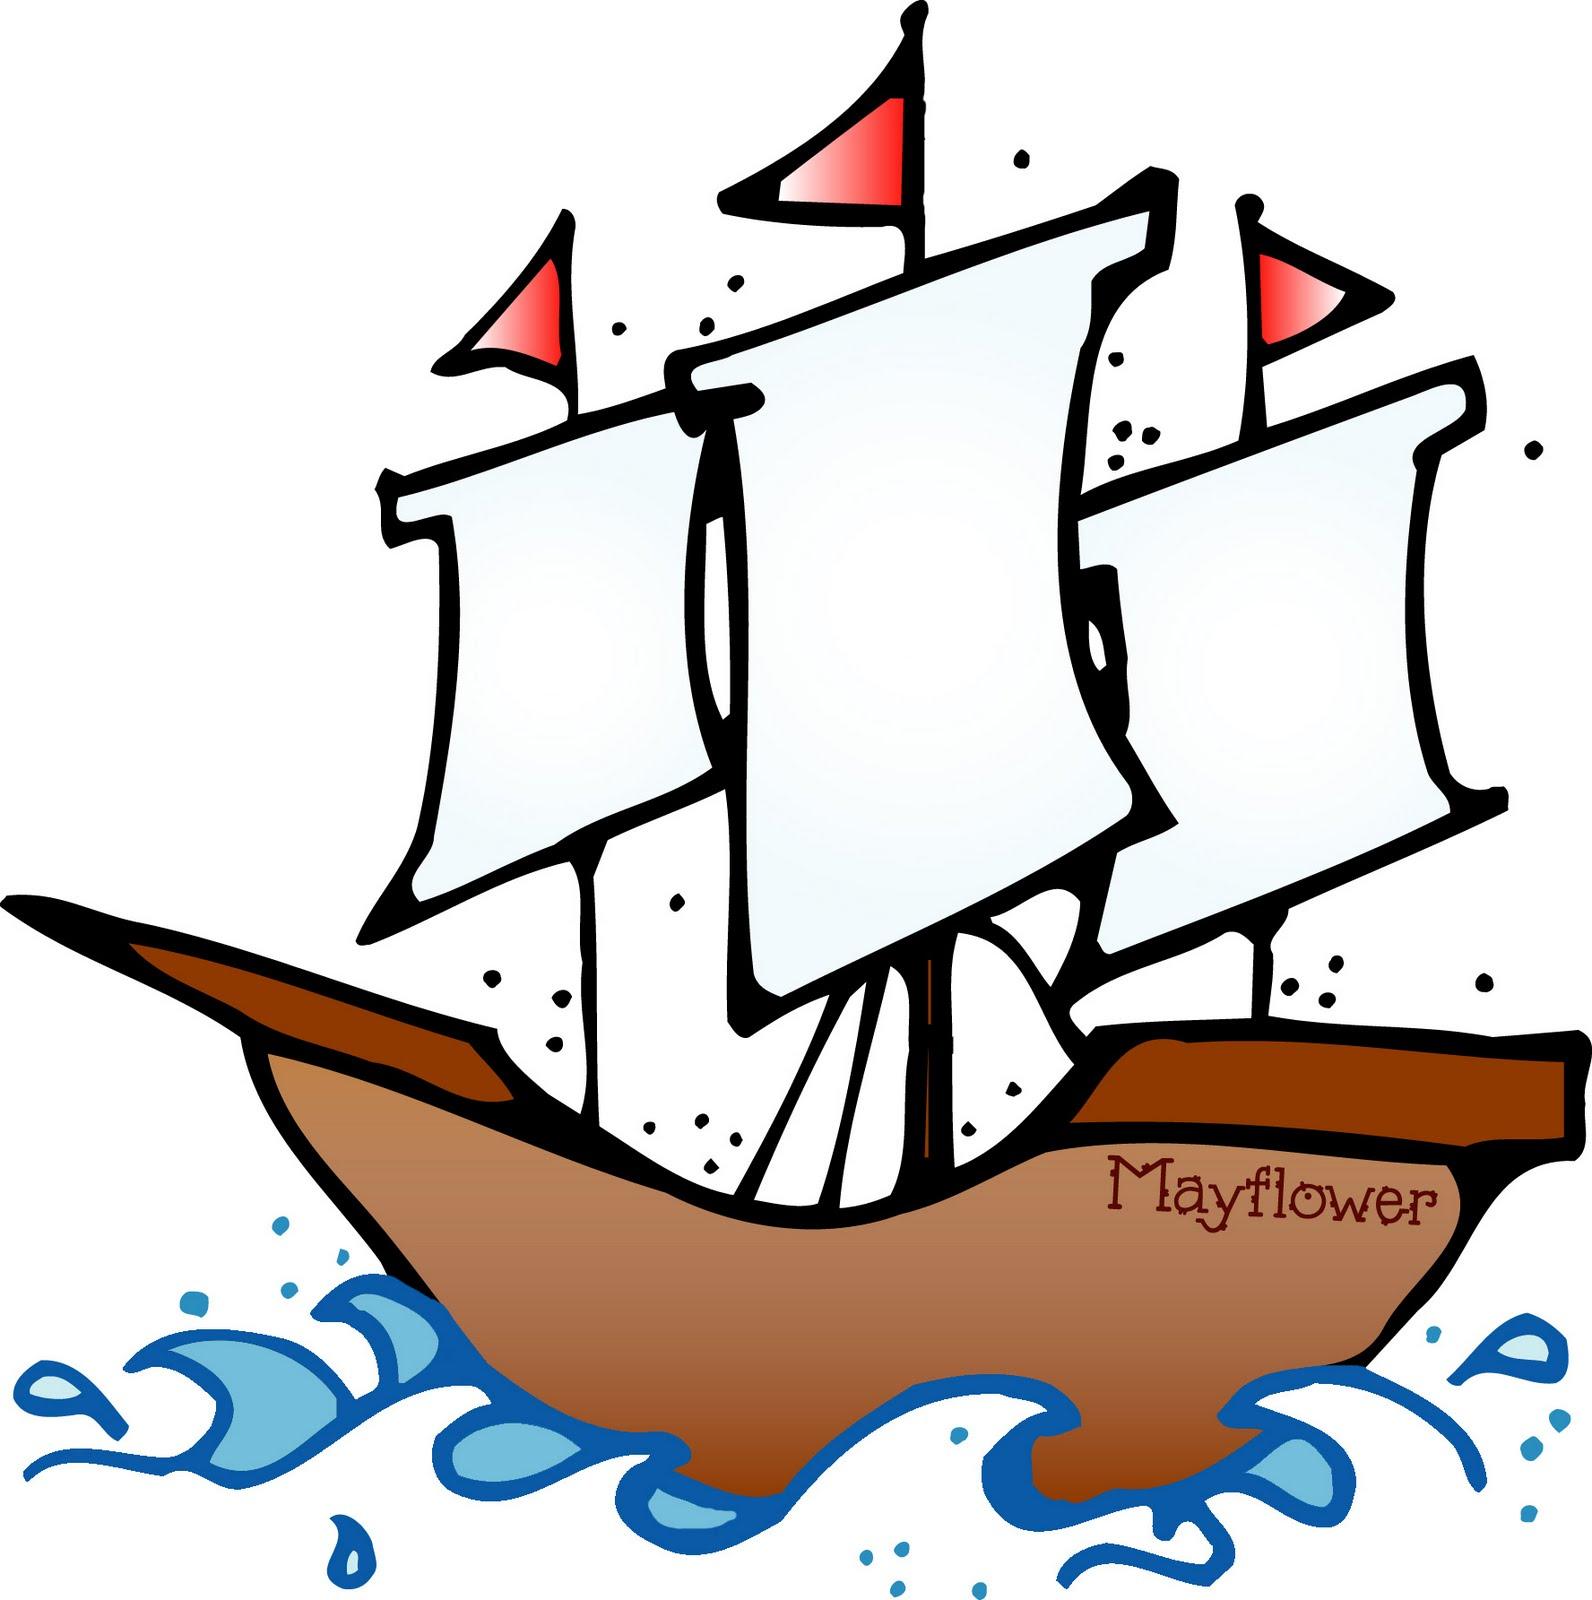 Pix For Mayflower Clipart-Pix For Mayflower Clipart-17